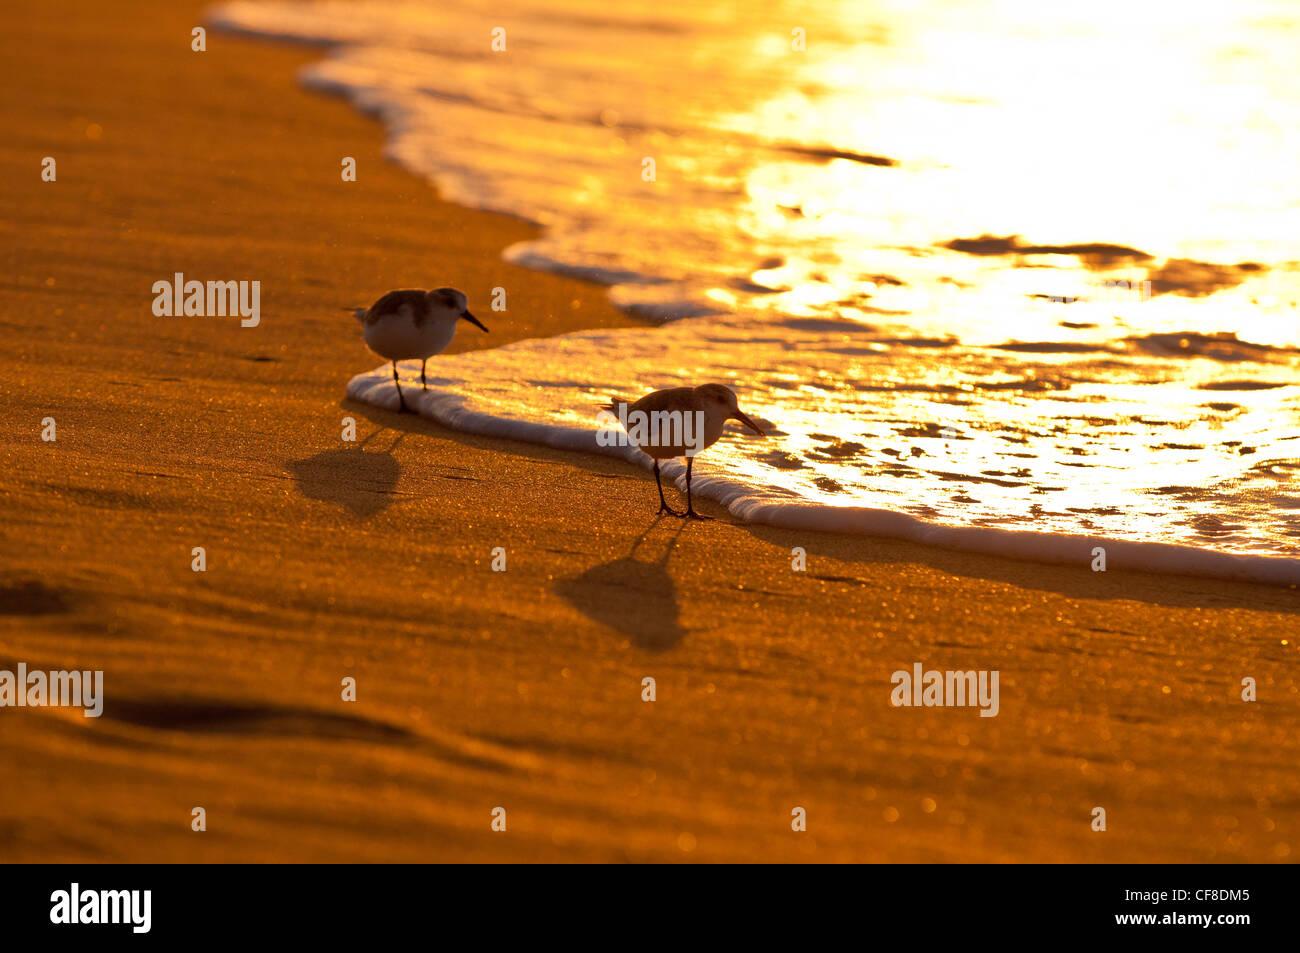 Sanderlings-'Hunakai' in Hawaiian language (Calidris alba), Polihale Beach, Kauai, Hawaii - Stock Image